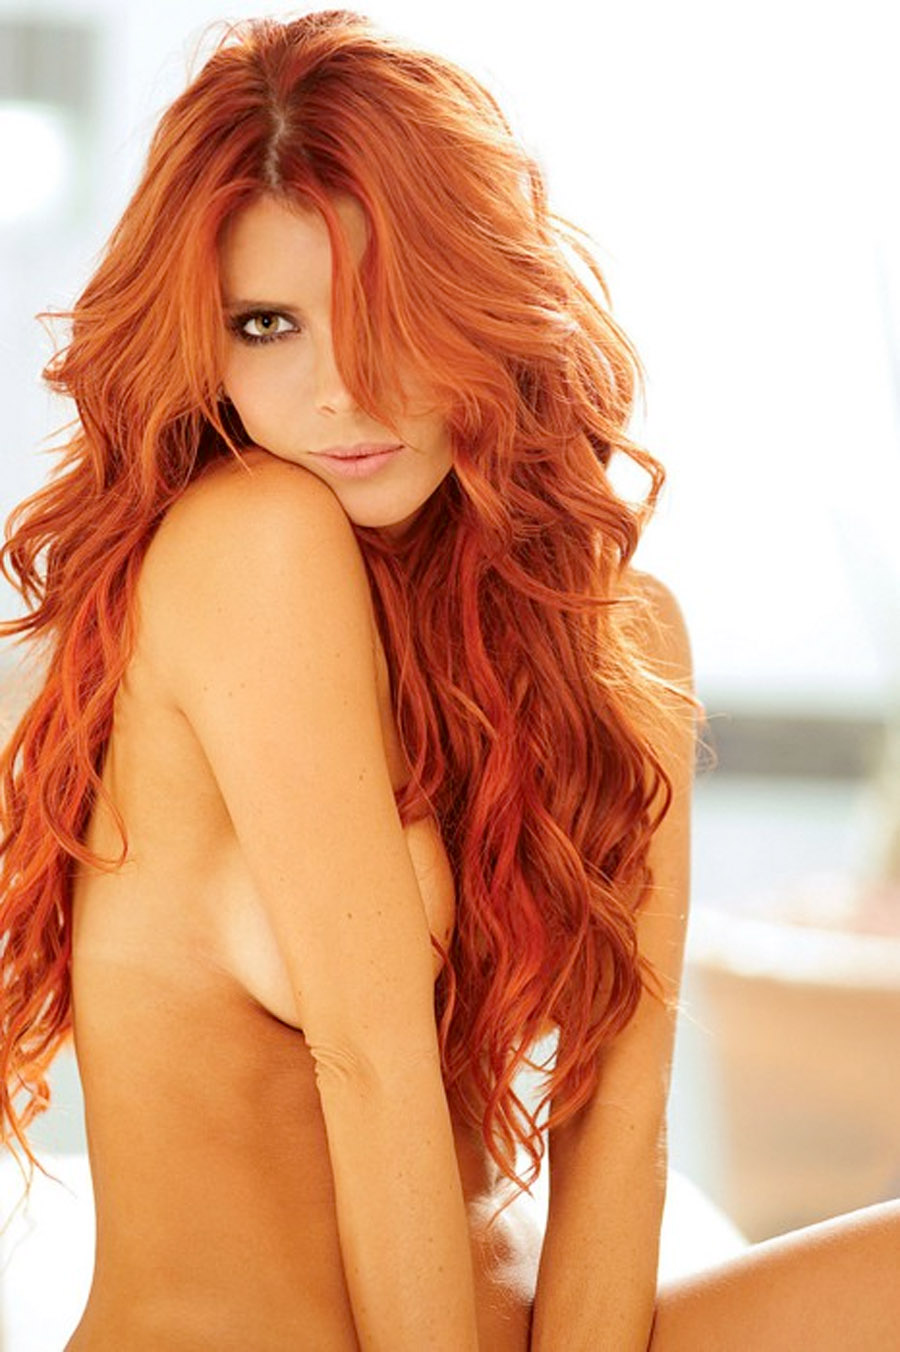 Nude Red Heads Women 100